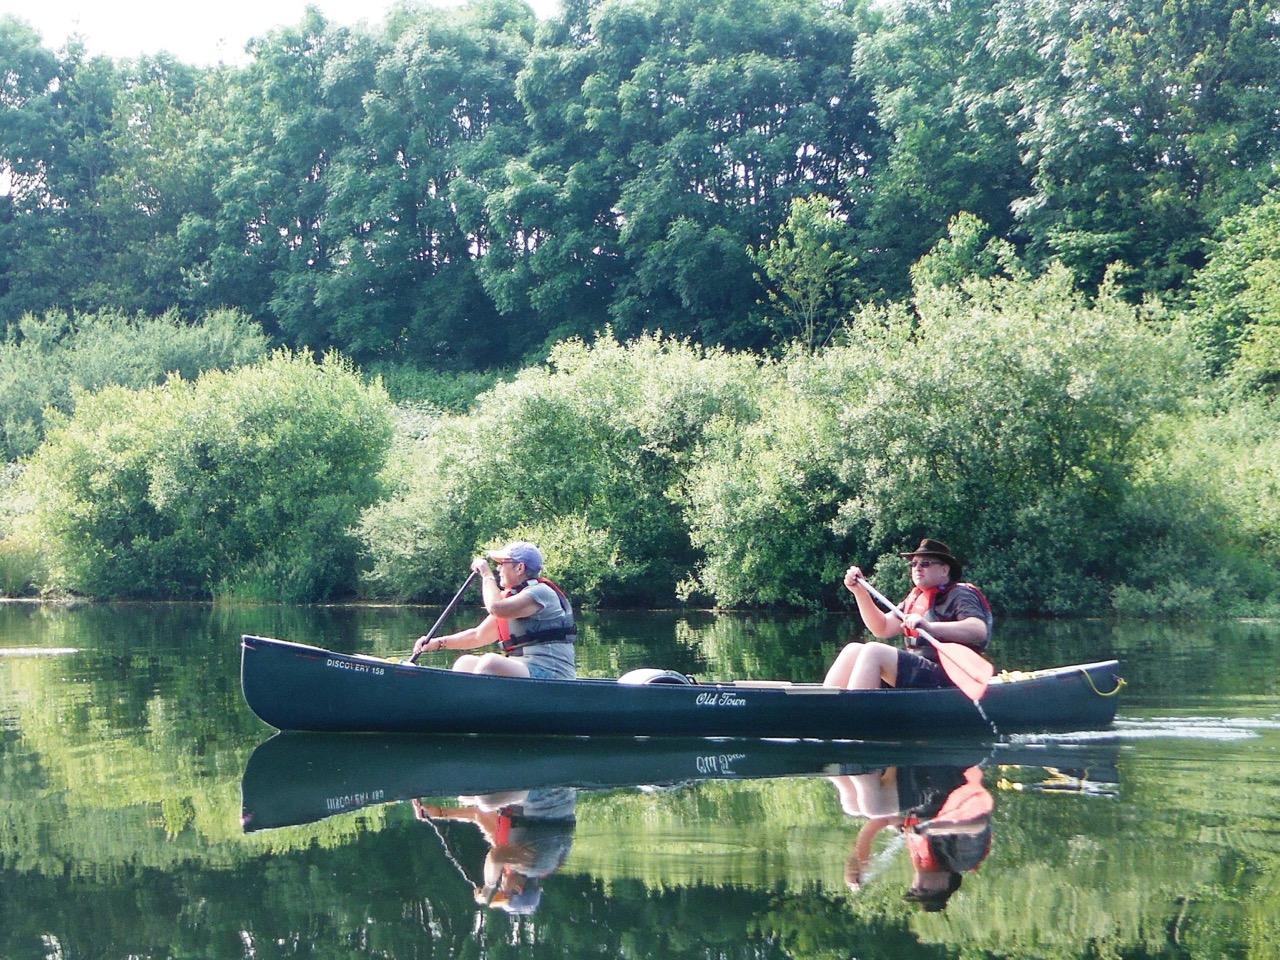 Roadford Lake